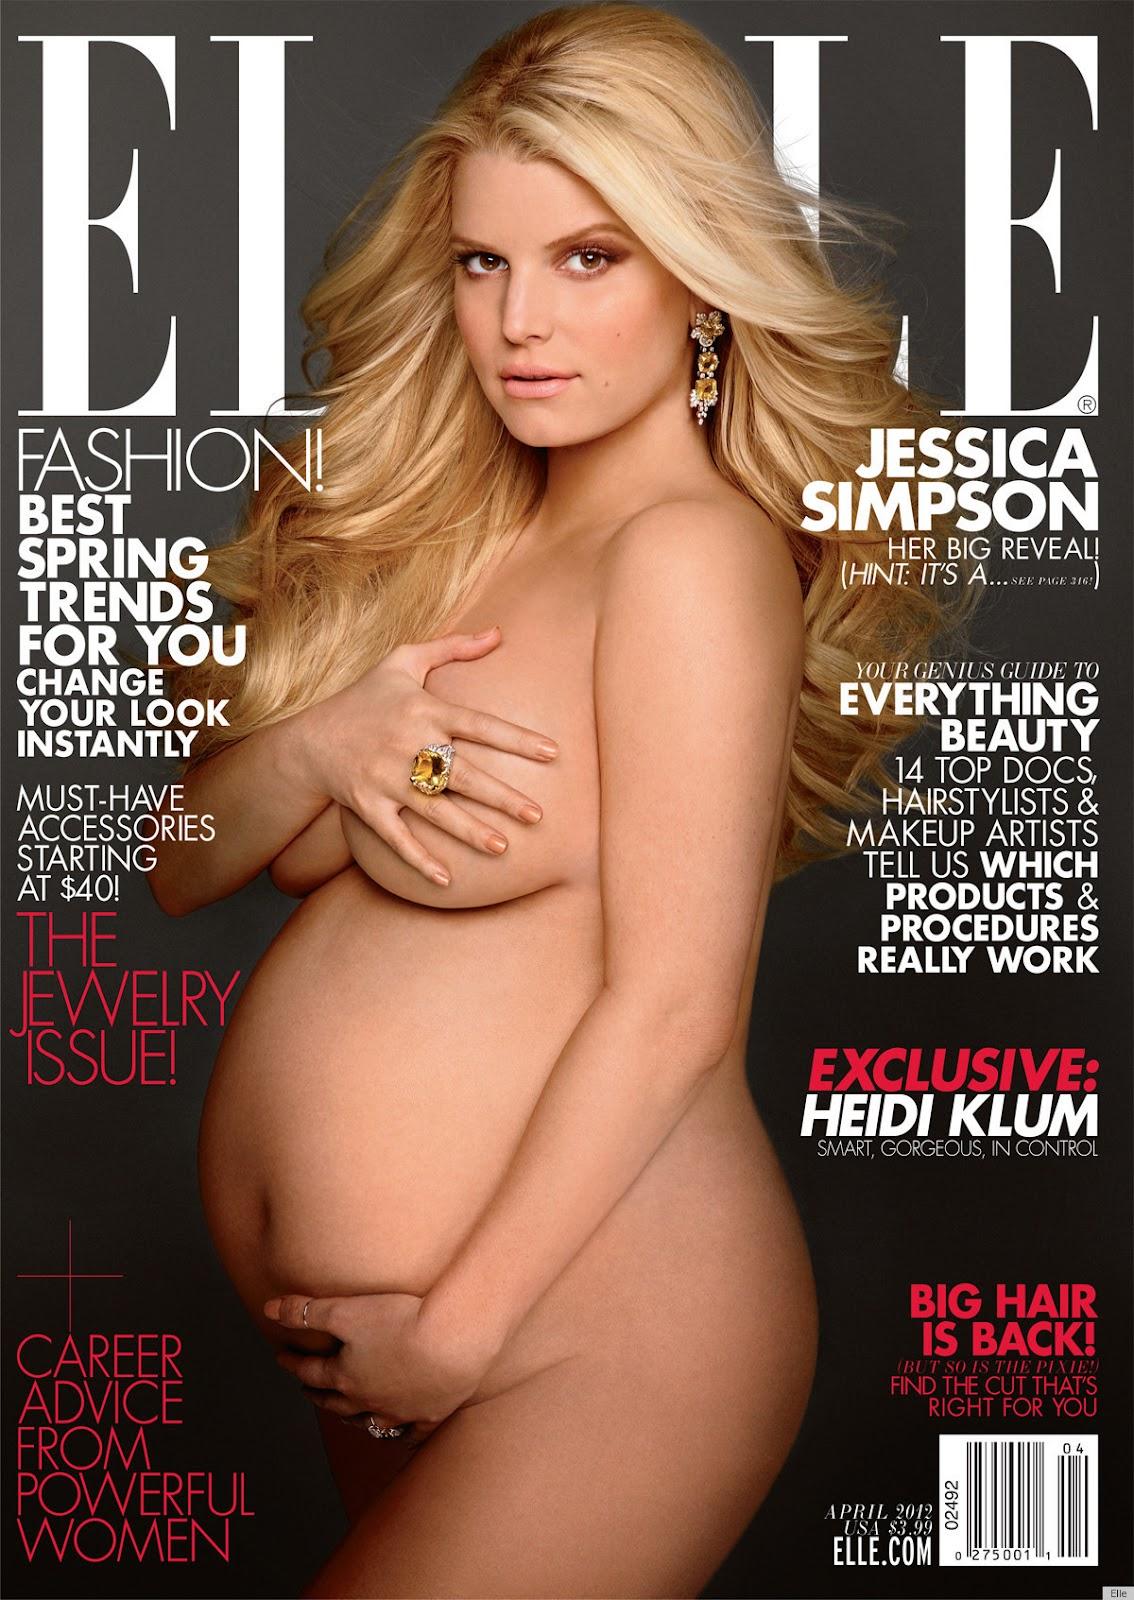 http://2.bp.blogspot.com/-H5B9EYGCS9g/T1gCUcys4uI/AAAAAAAAB7U/ddI_QA_ycuU/s1600/JESSICA-SIMPSON-ELLE-PREGNANT-1.jpg